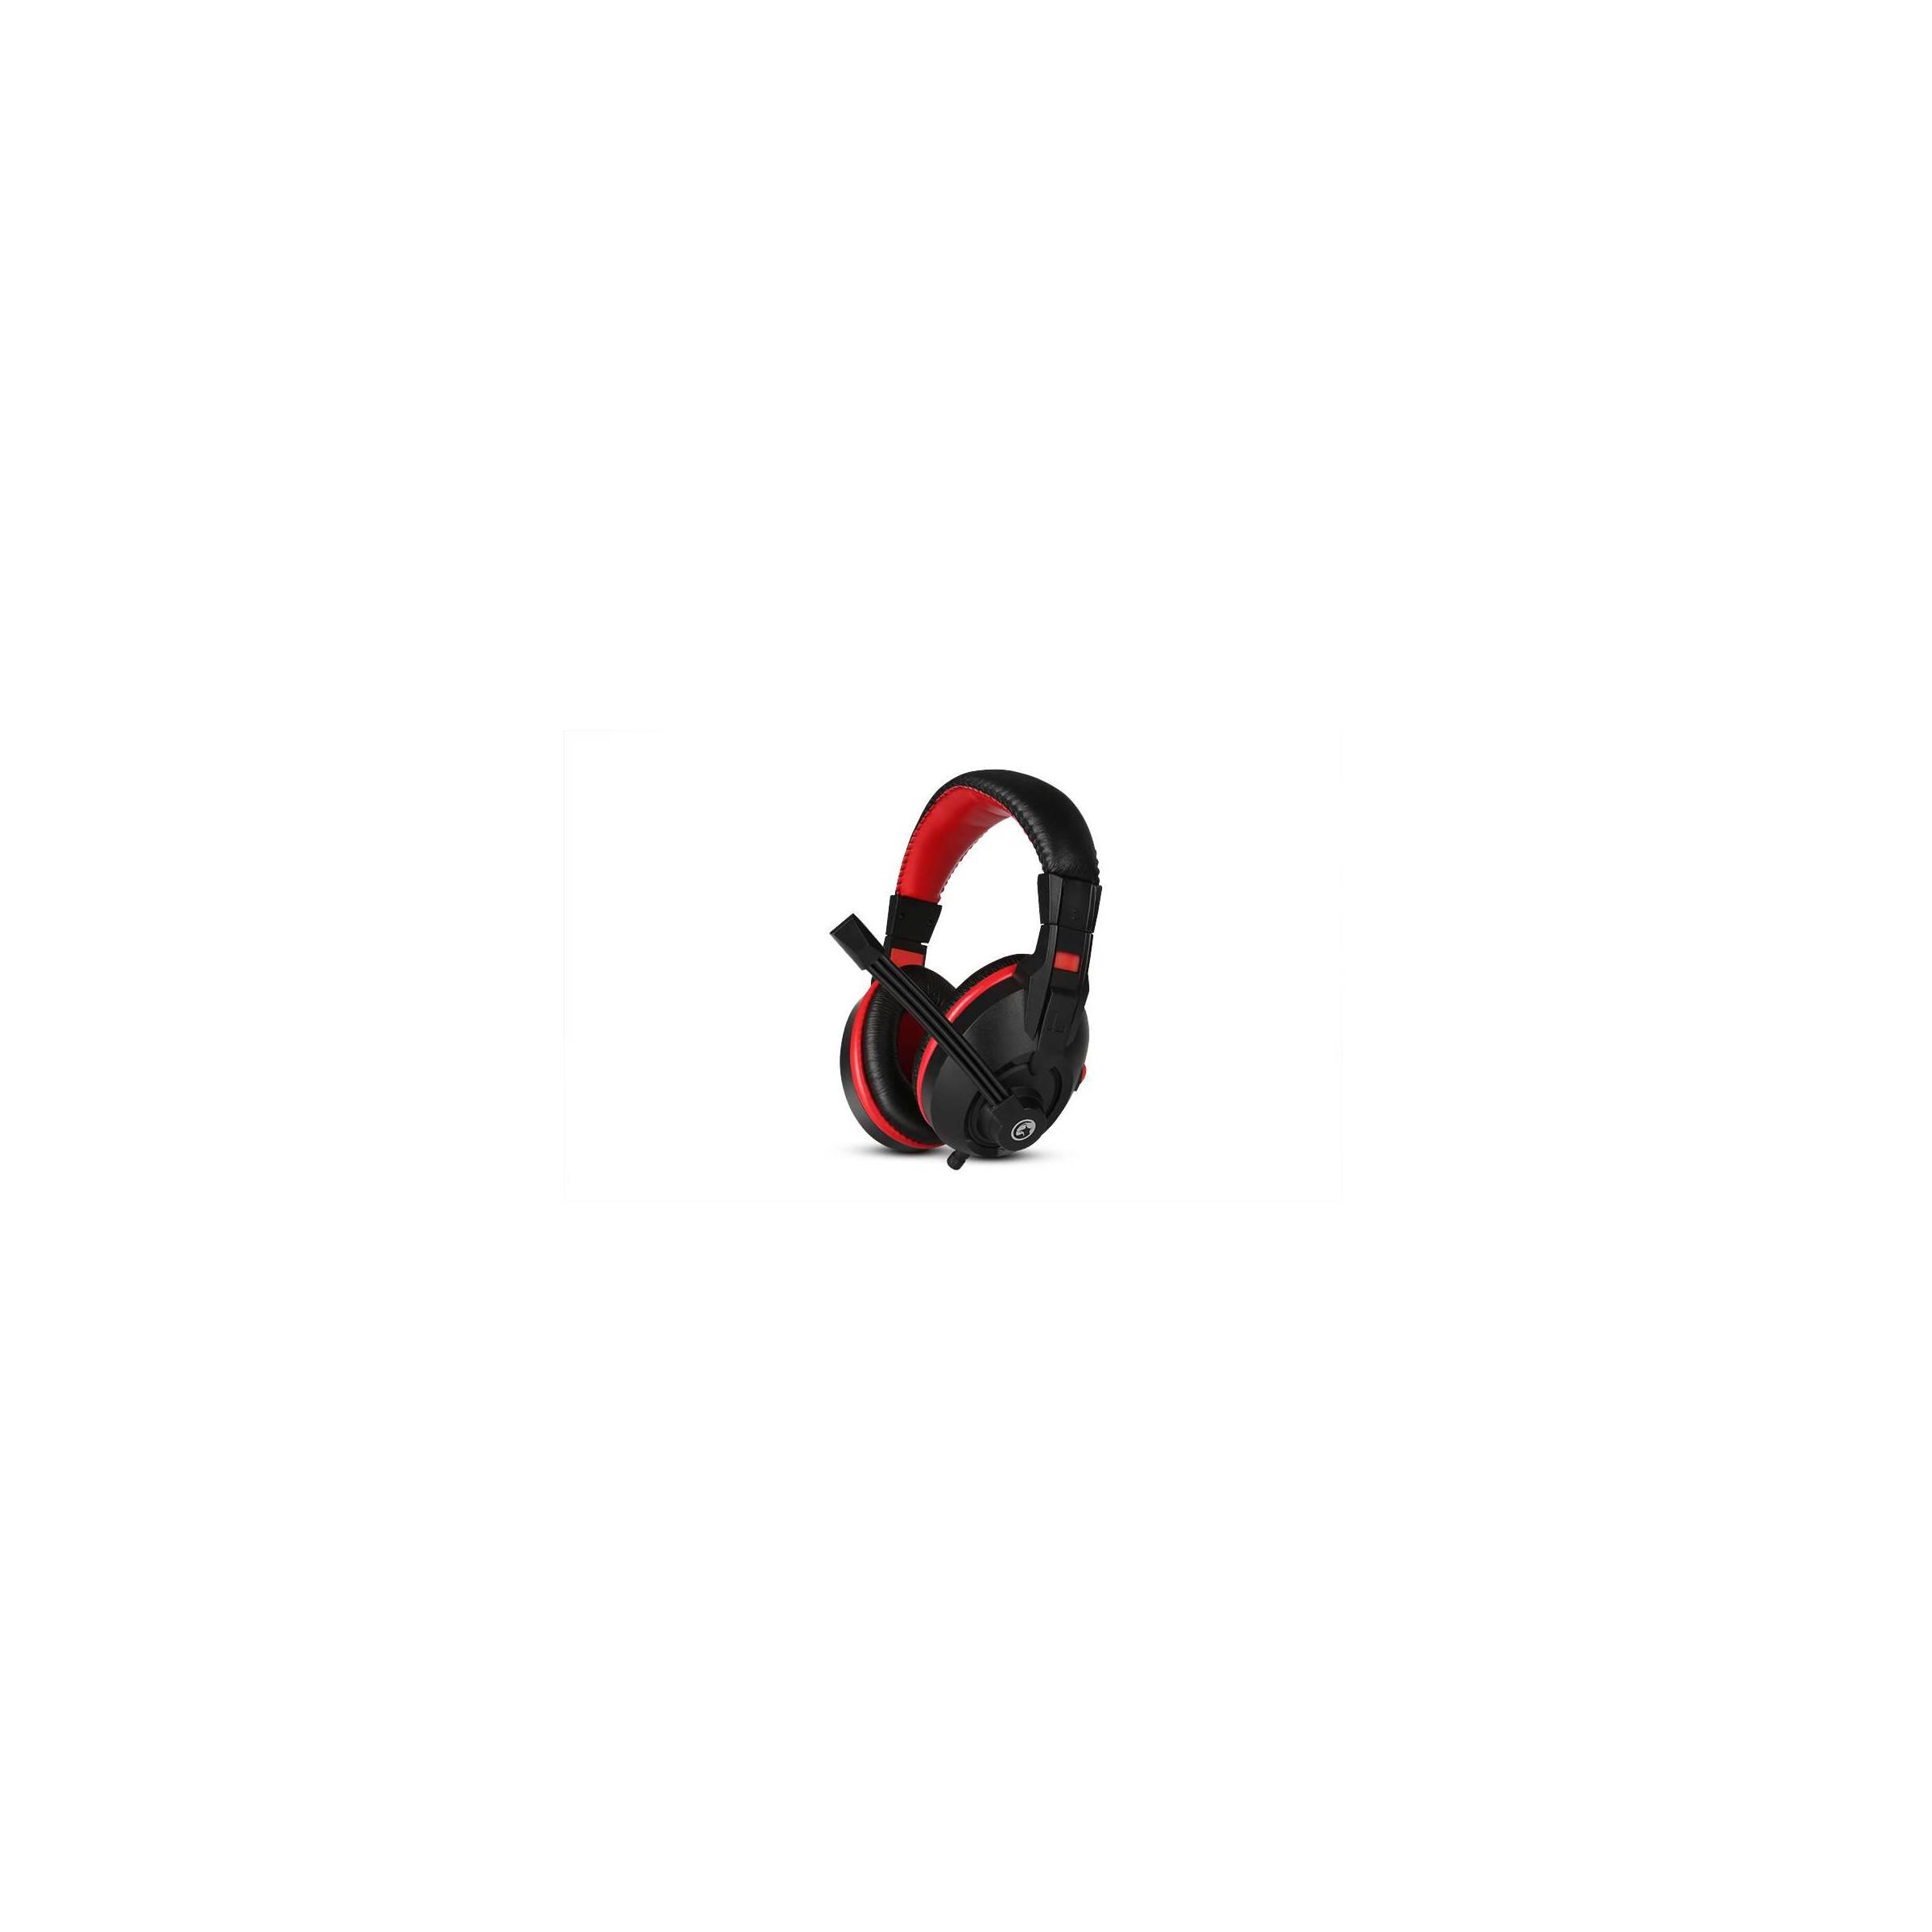 Marvo gaming headset h8321 fra scorpion by marvo fra mackabler.dk